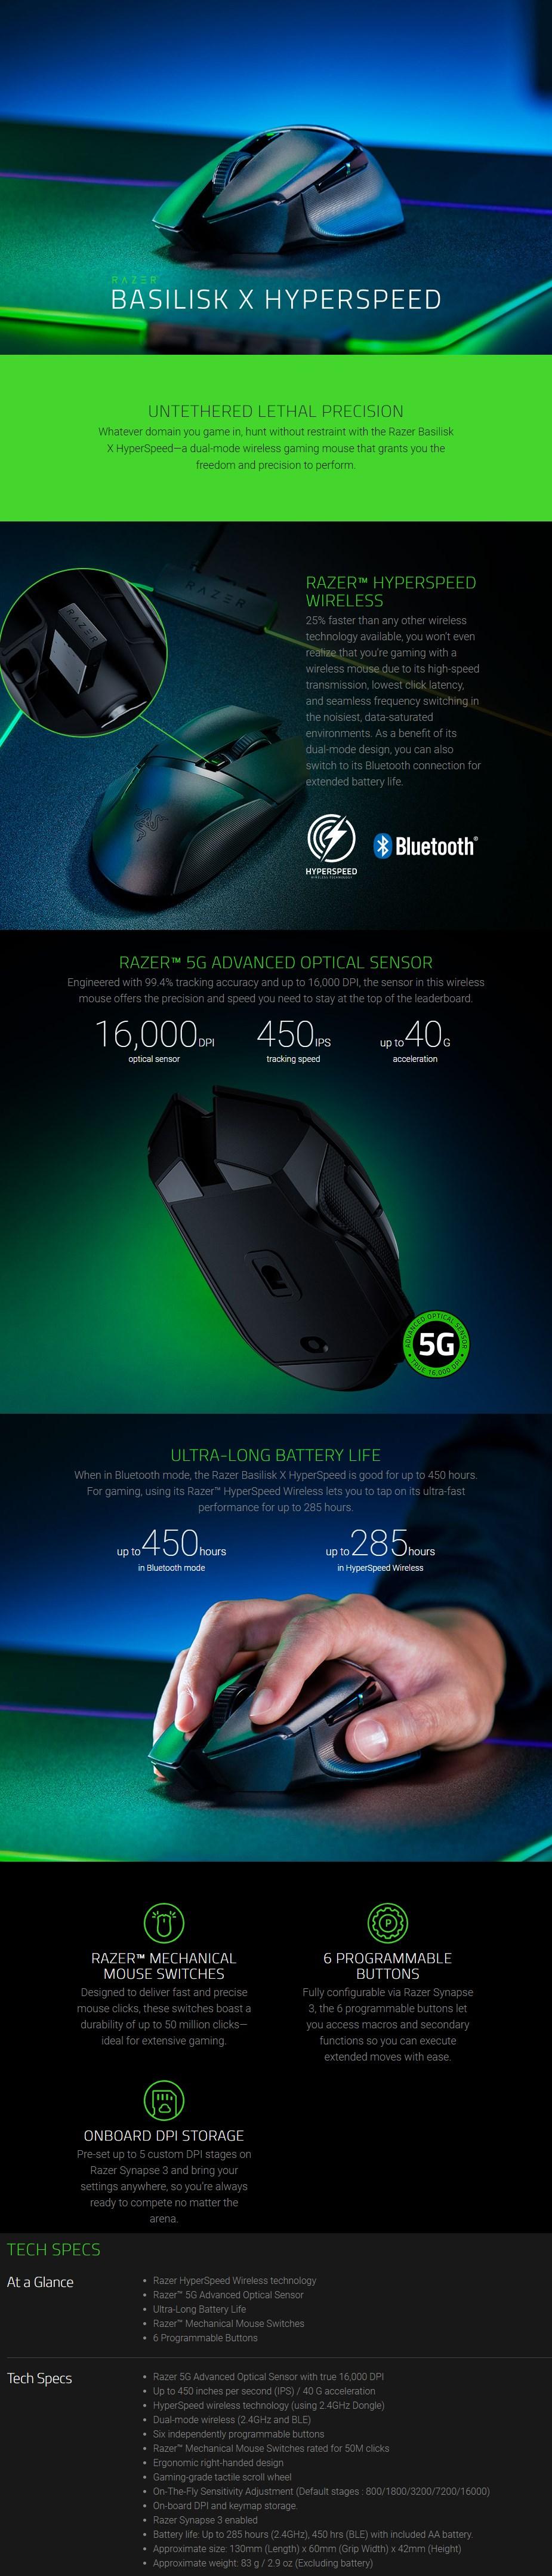 razer-basilisk-x-hyperspeed-wireless-optical-gaming-mouse-ac29718-6.jpg